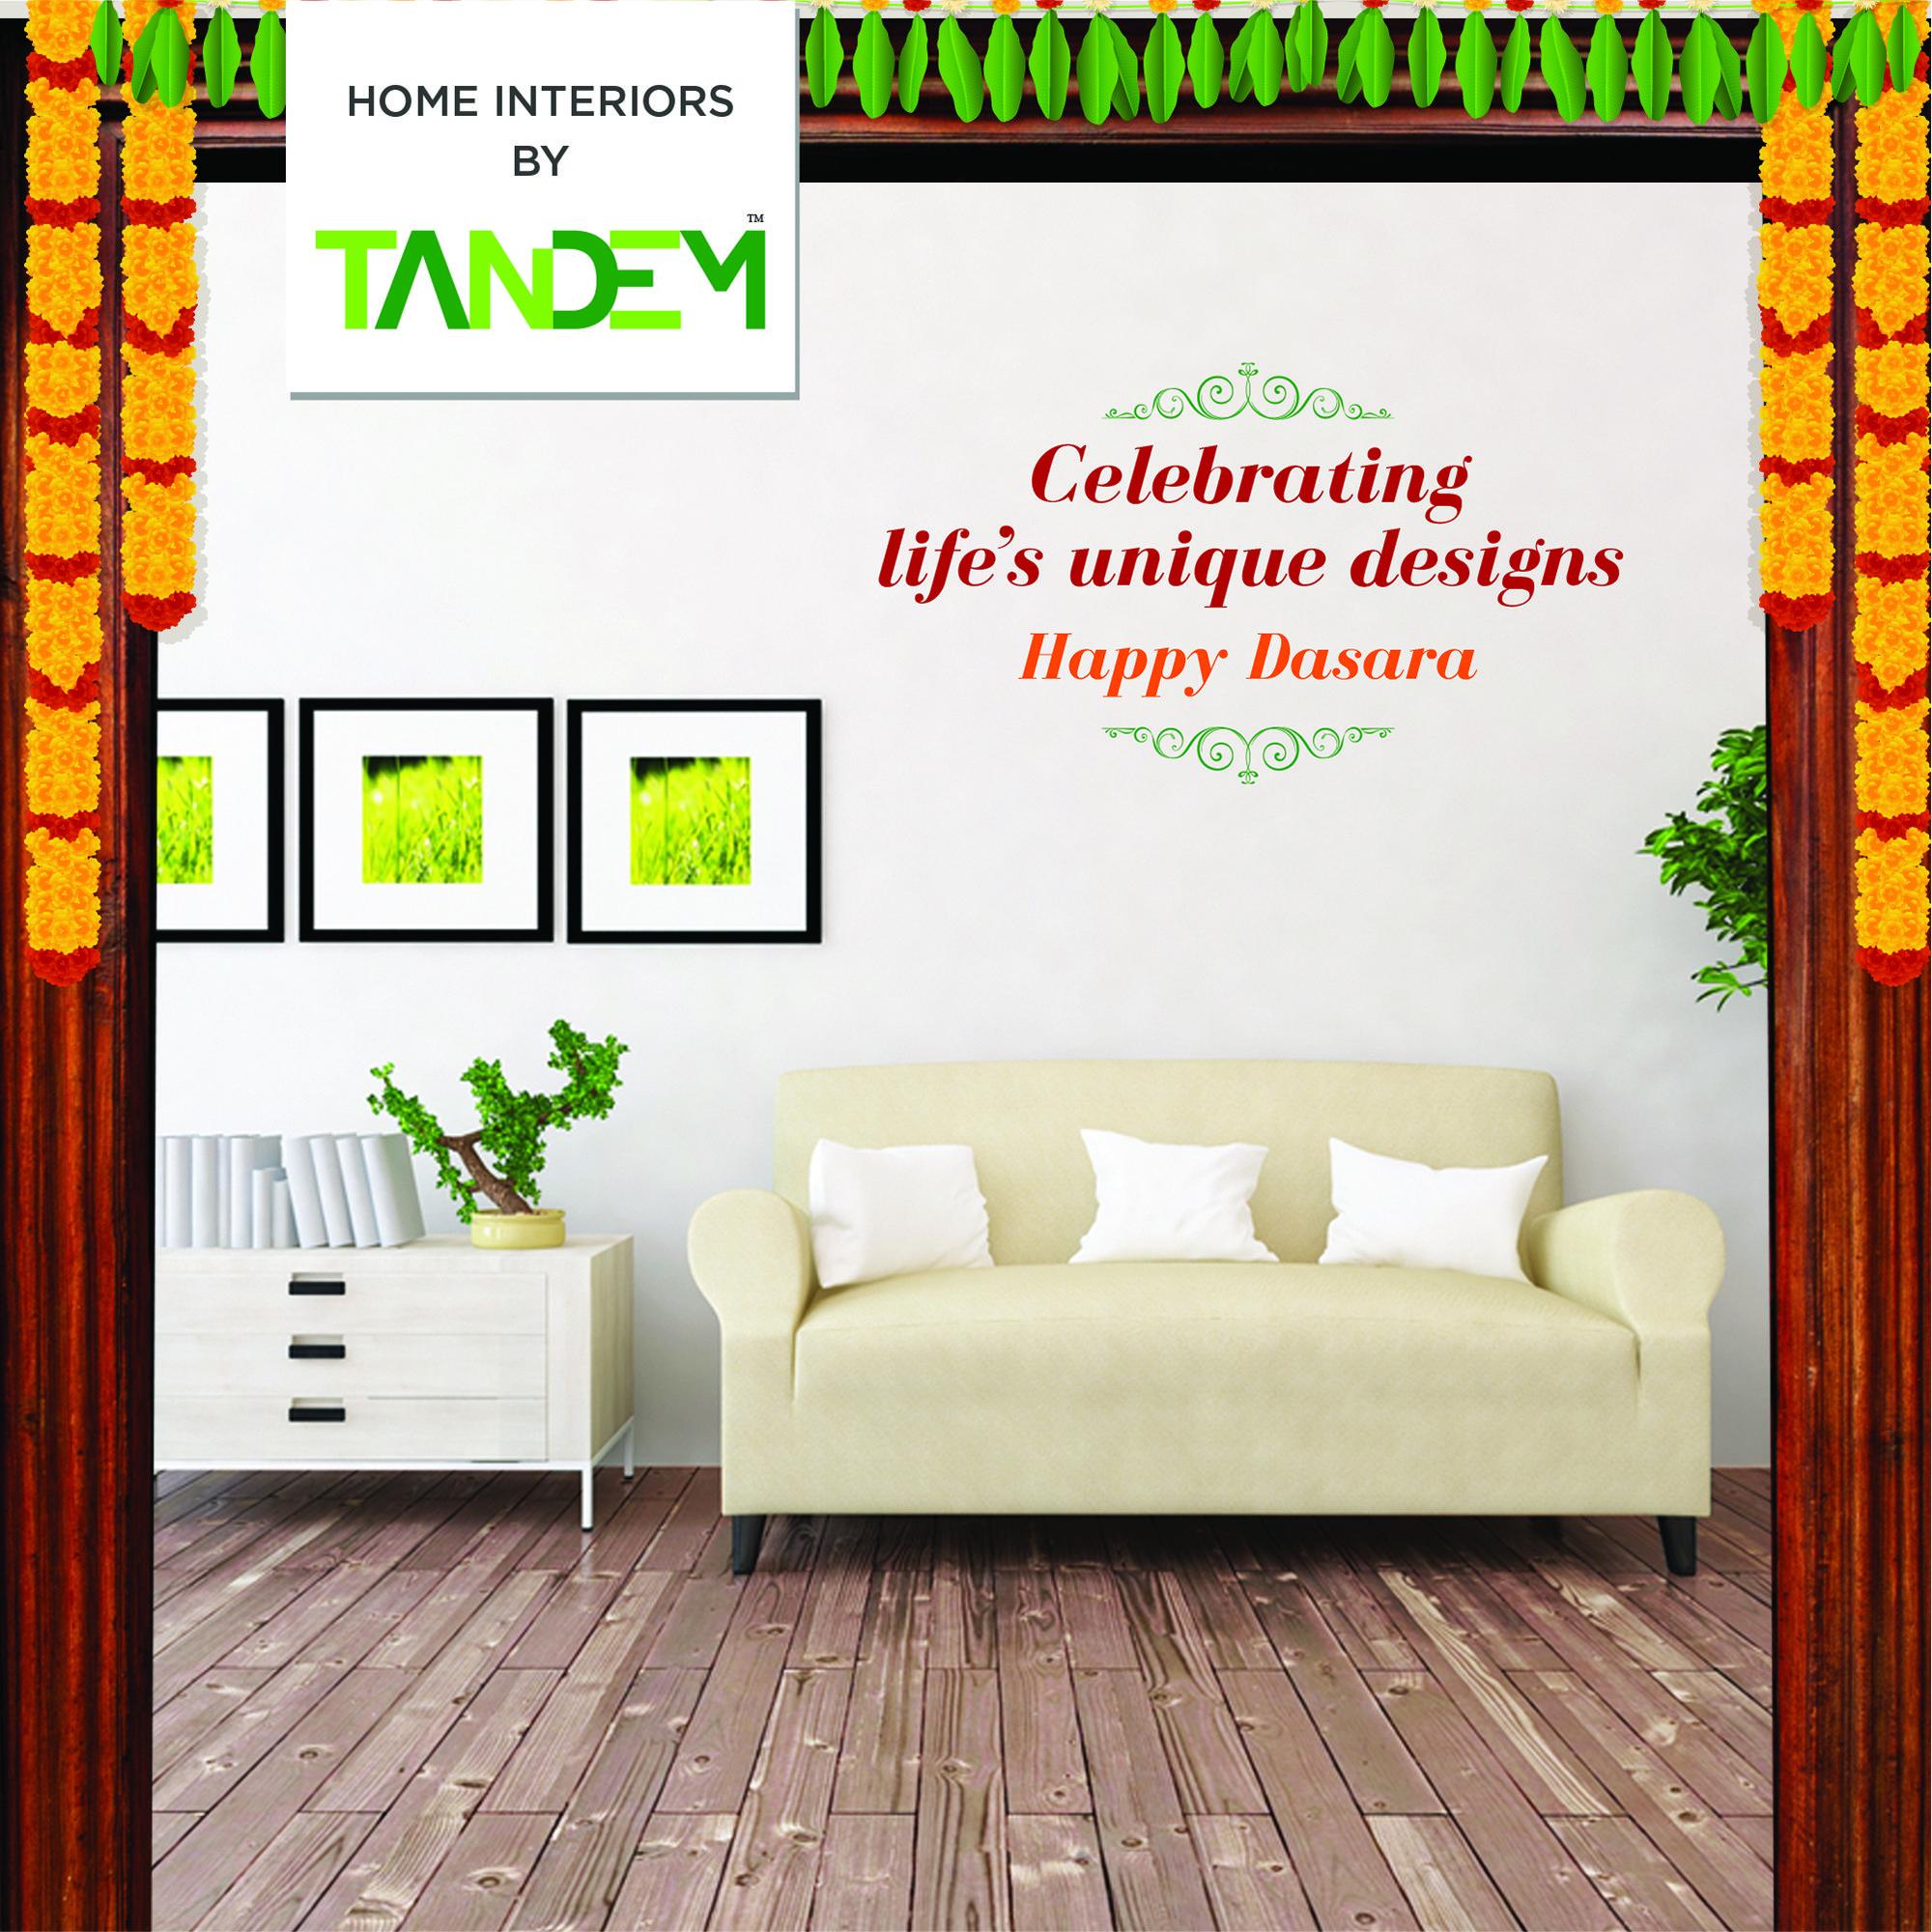 Happy Dussehra With Images Interior House Interior Design